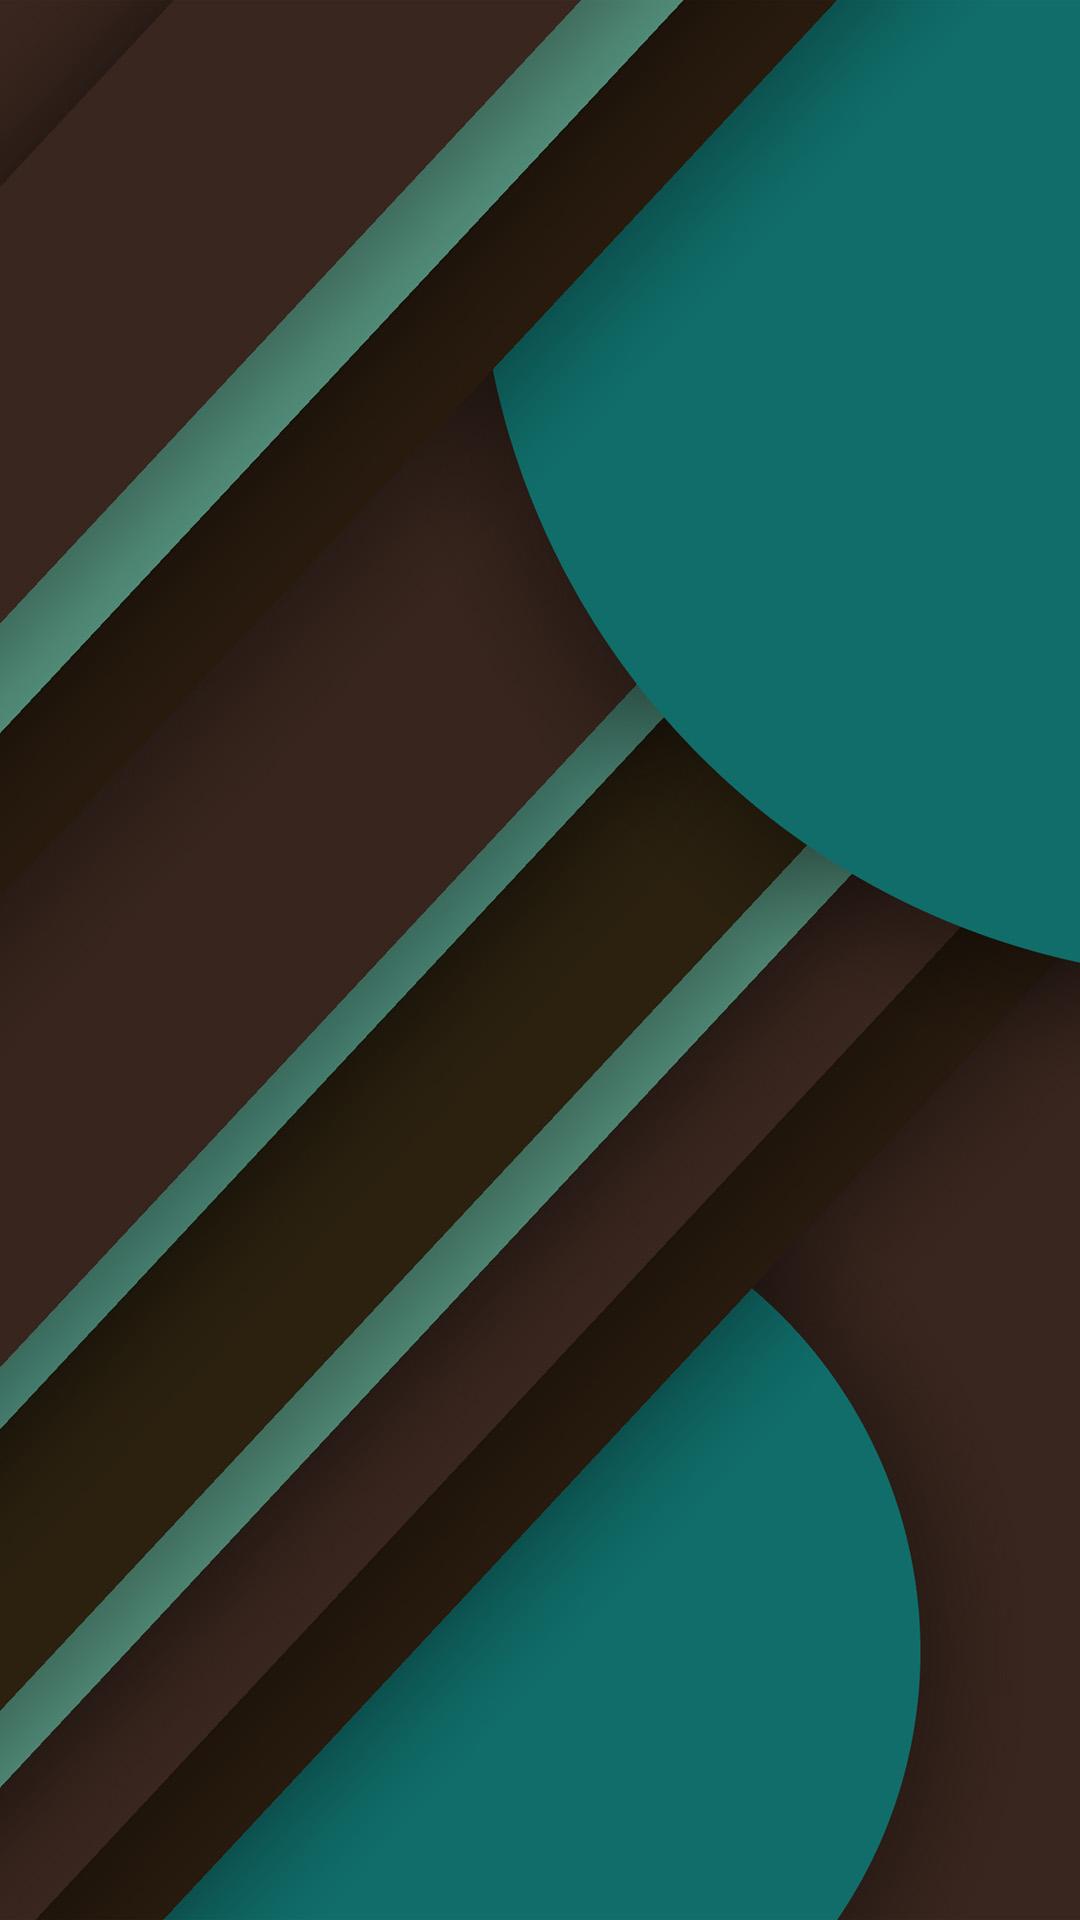 Earth Live Wallpaper Iphone Creative Iphone Backgrounds Free Download Pixelstalk Net